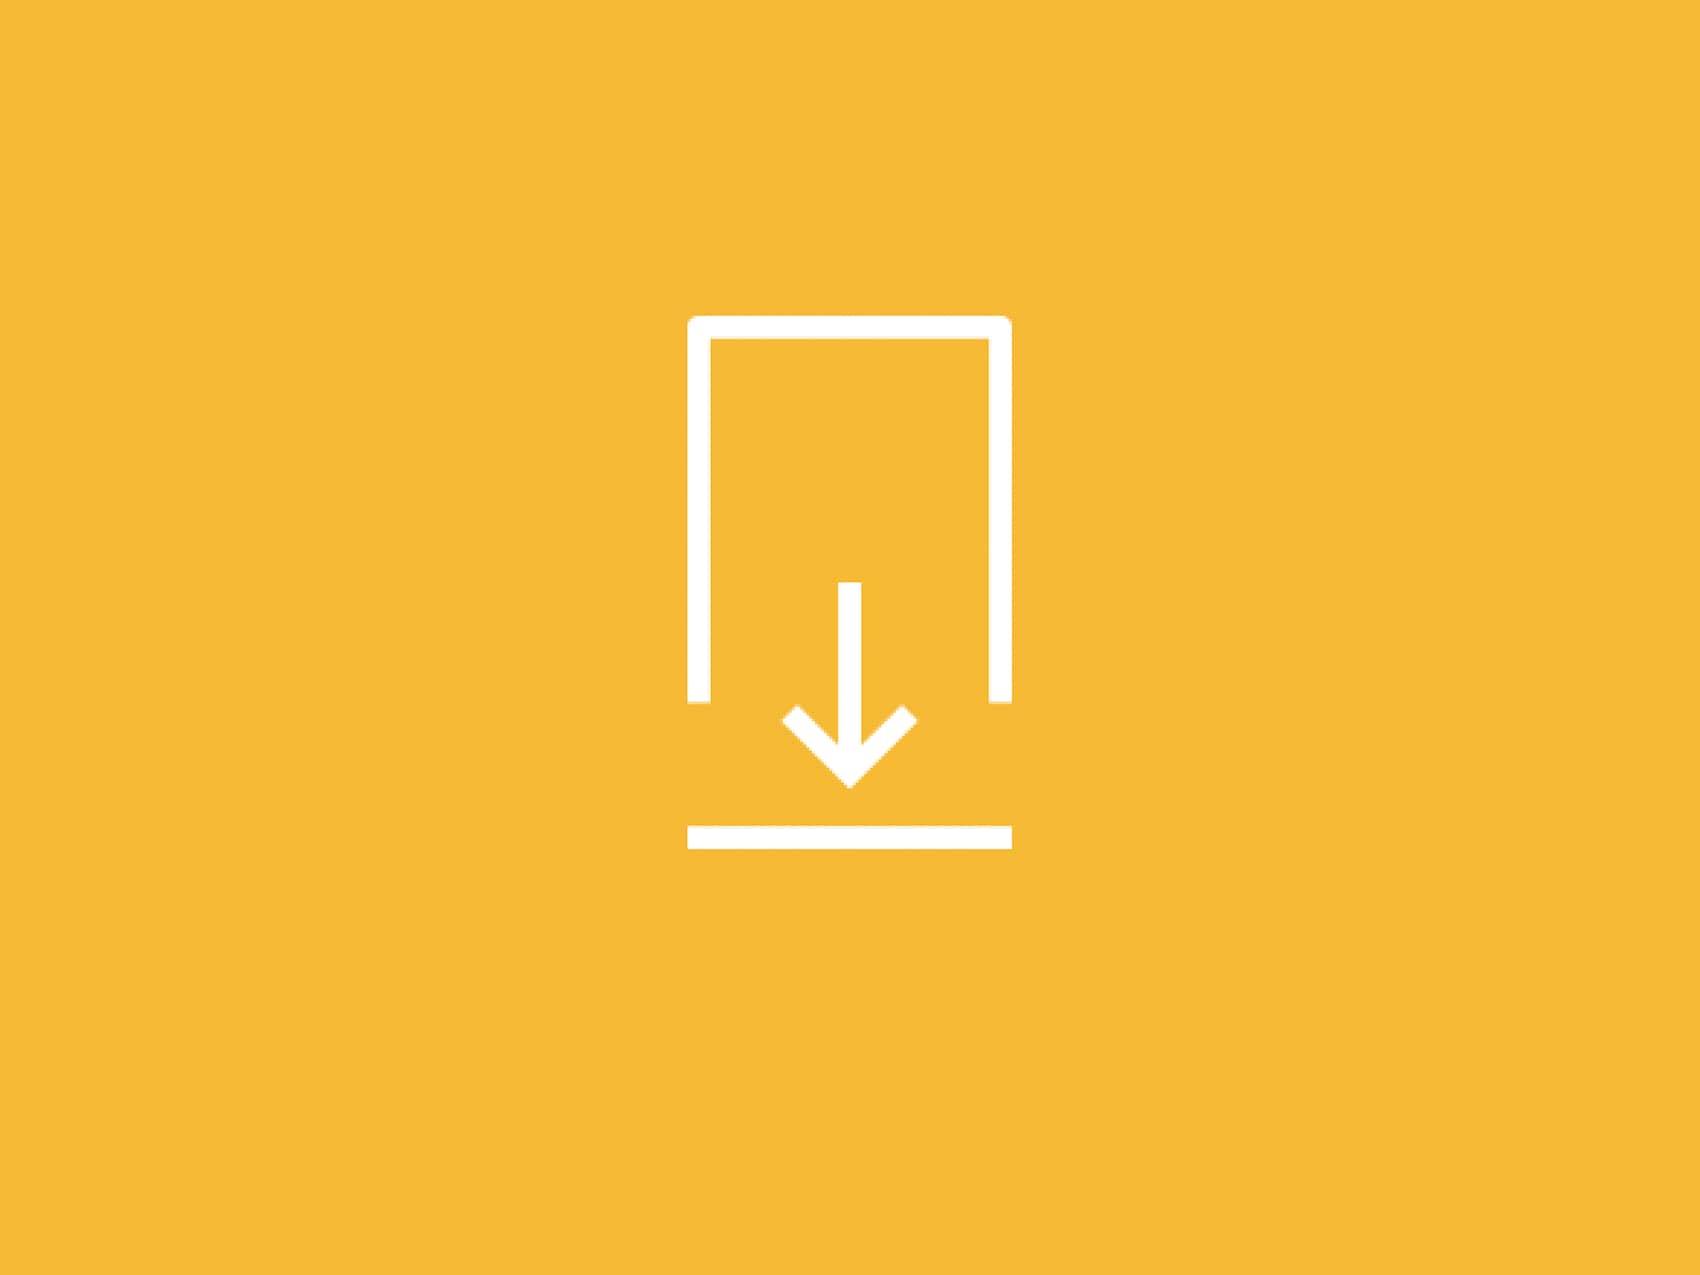 ebrochure-icon